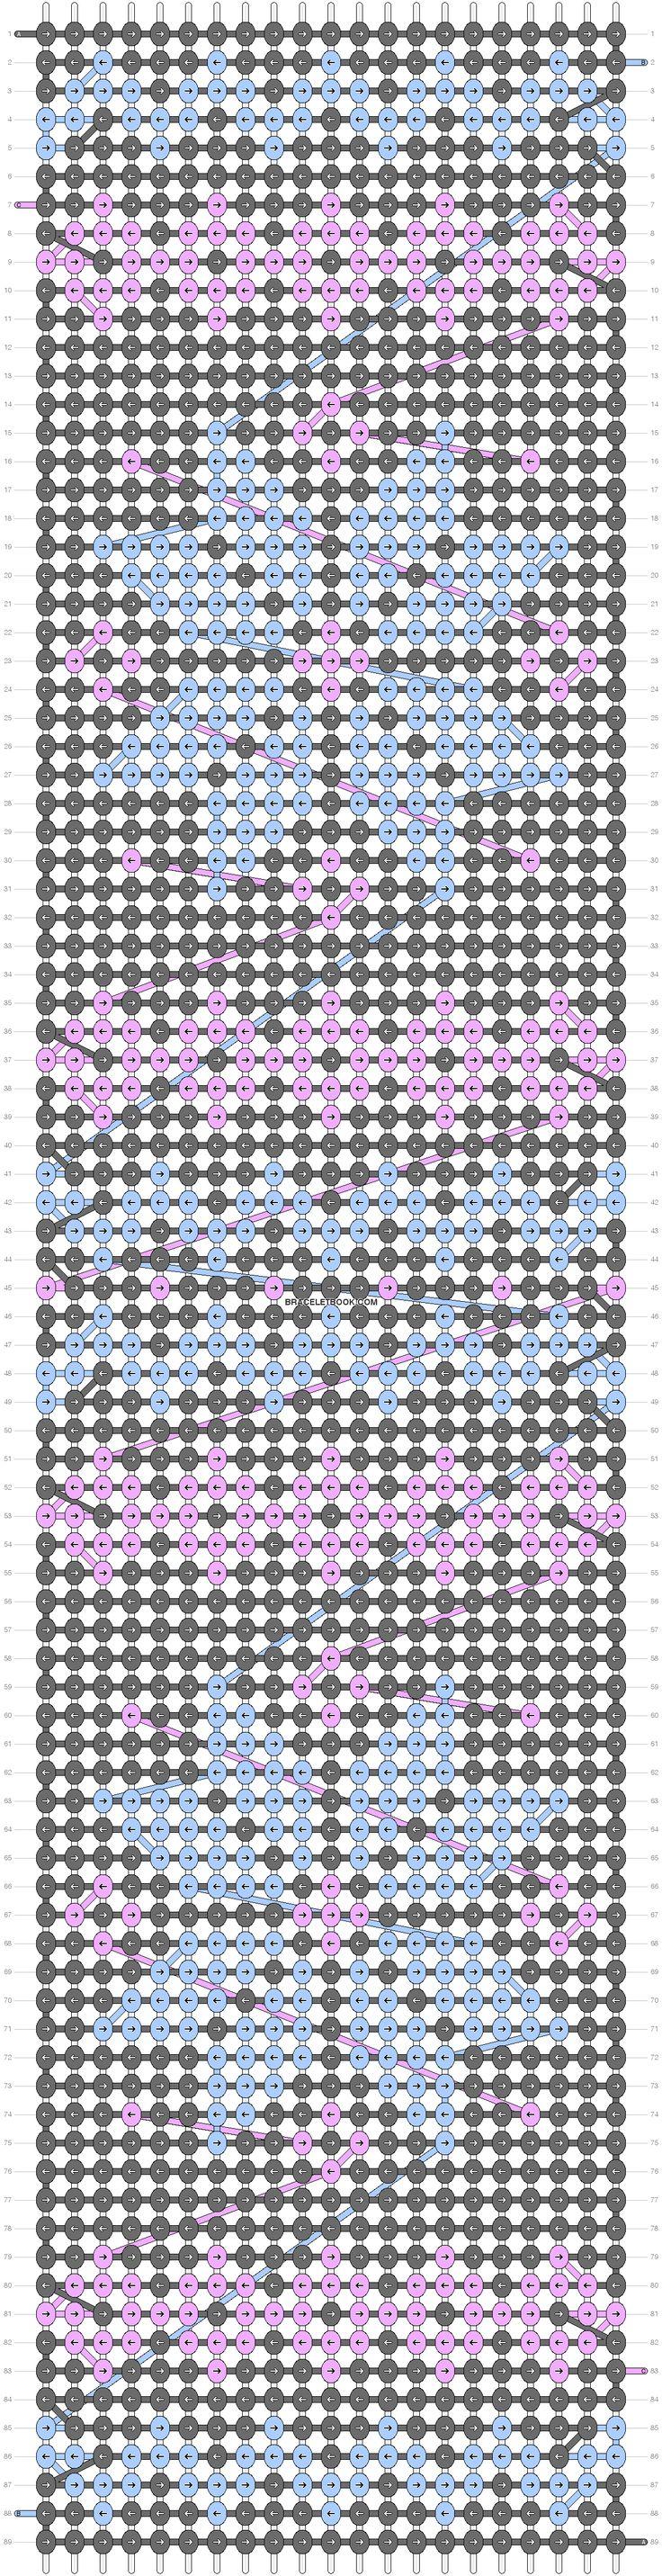 Wayuu Mochilla Bag Chart 87